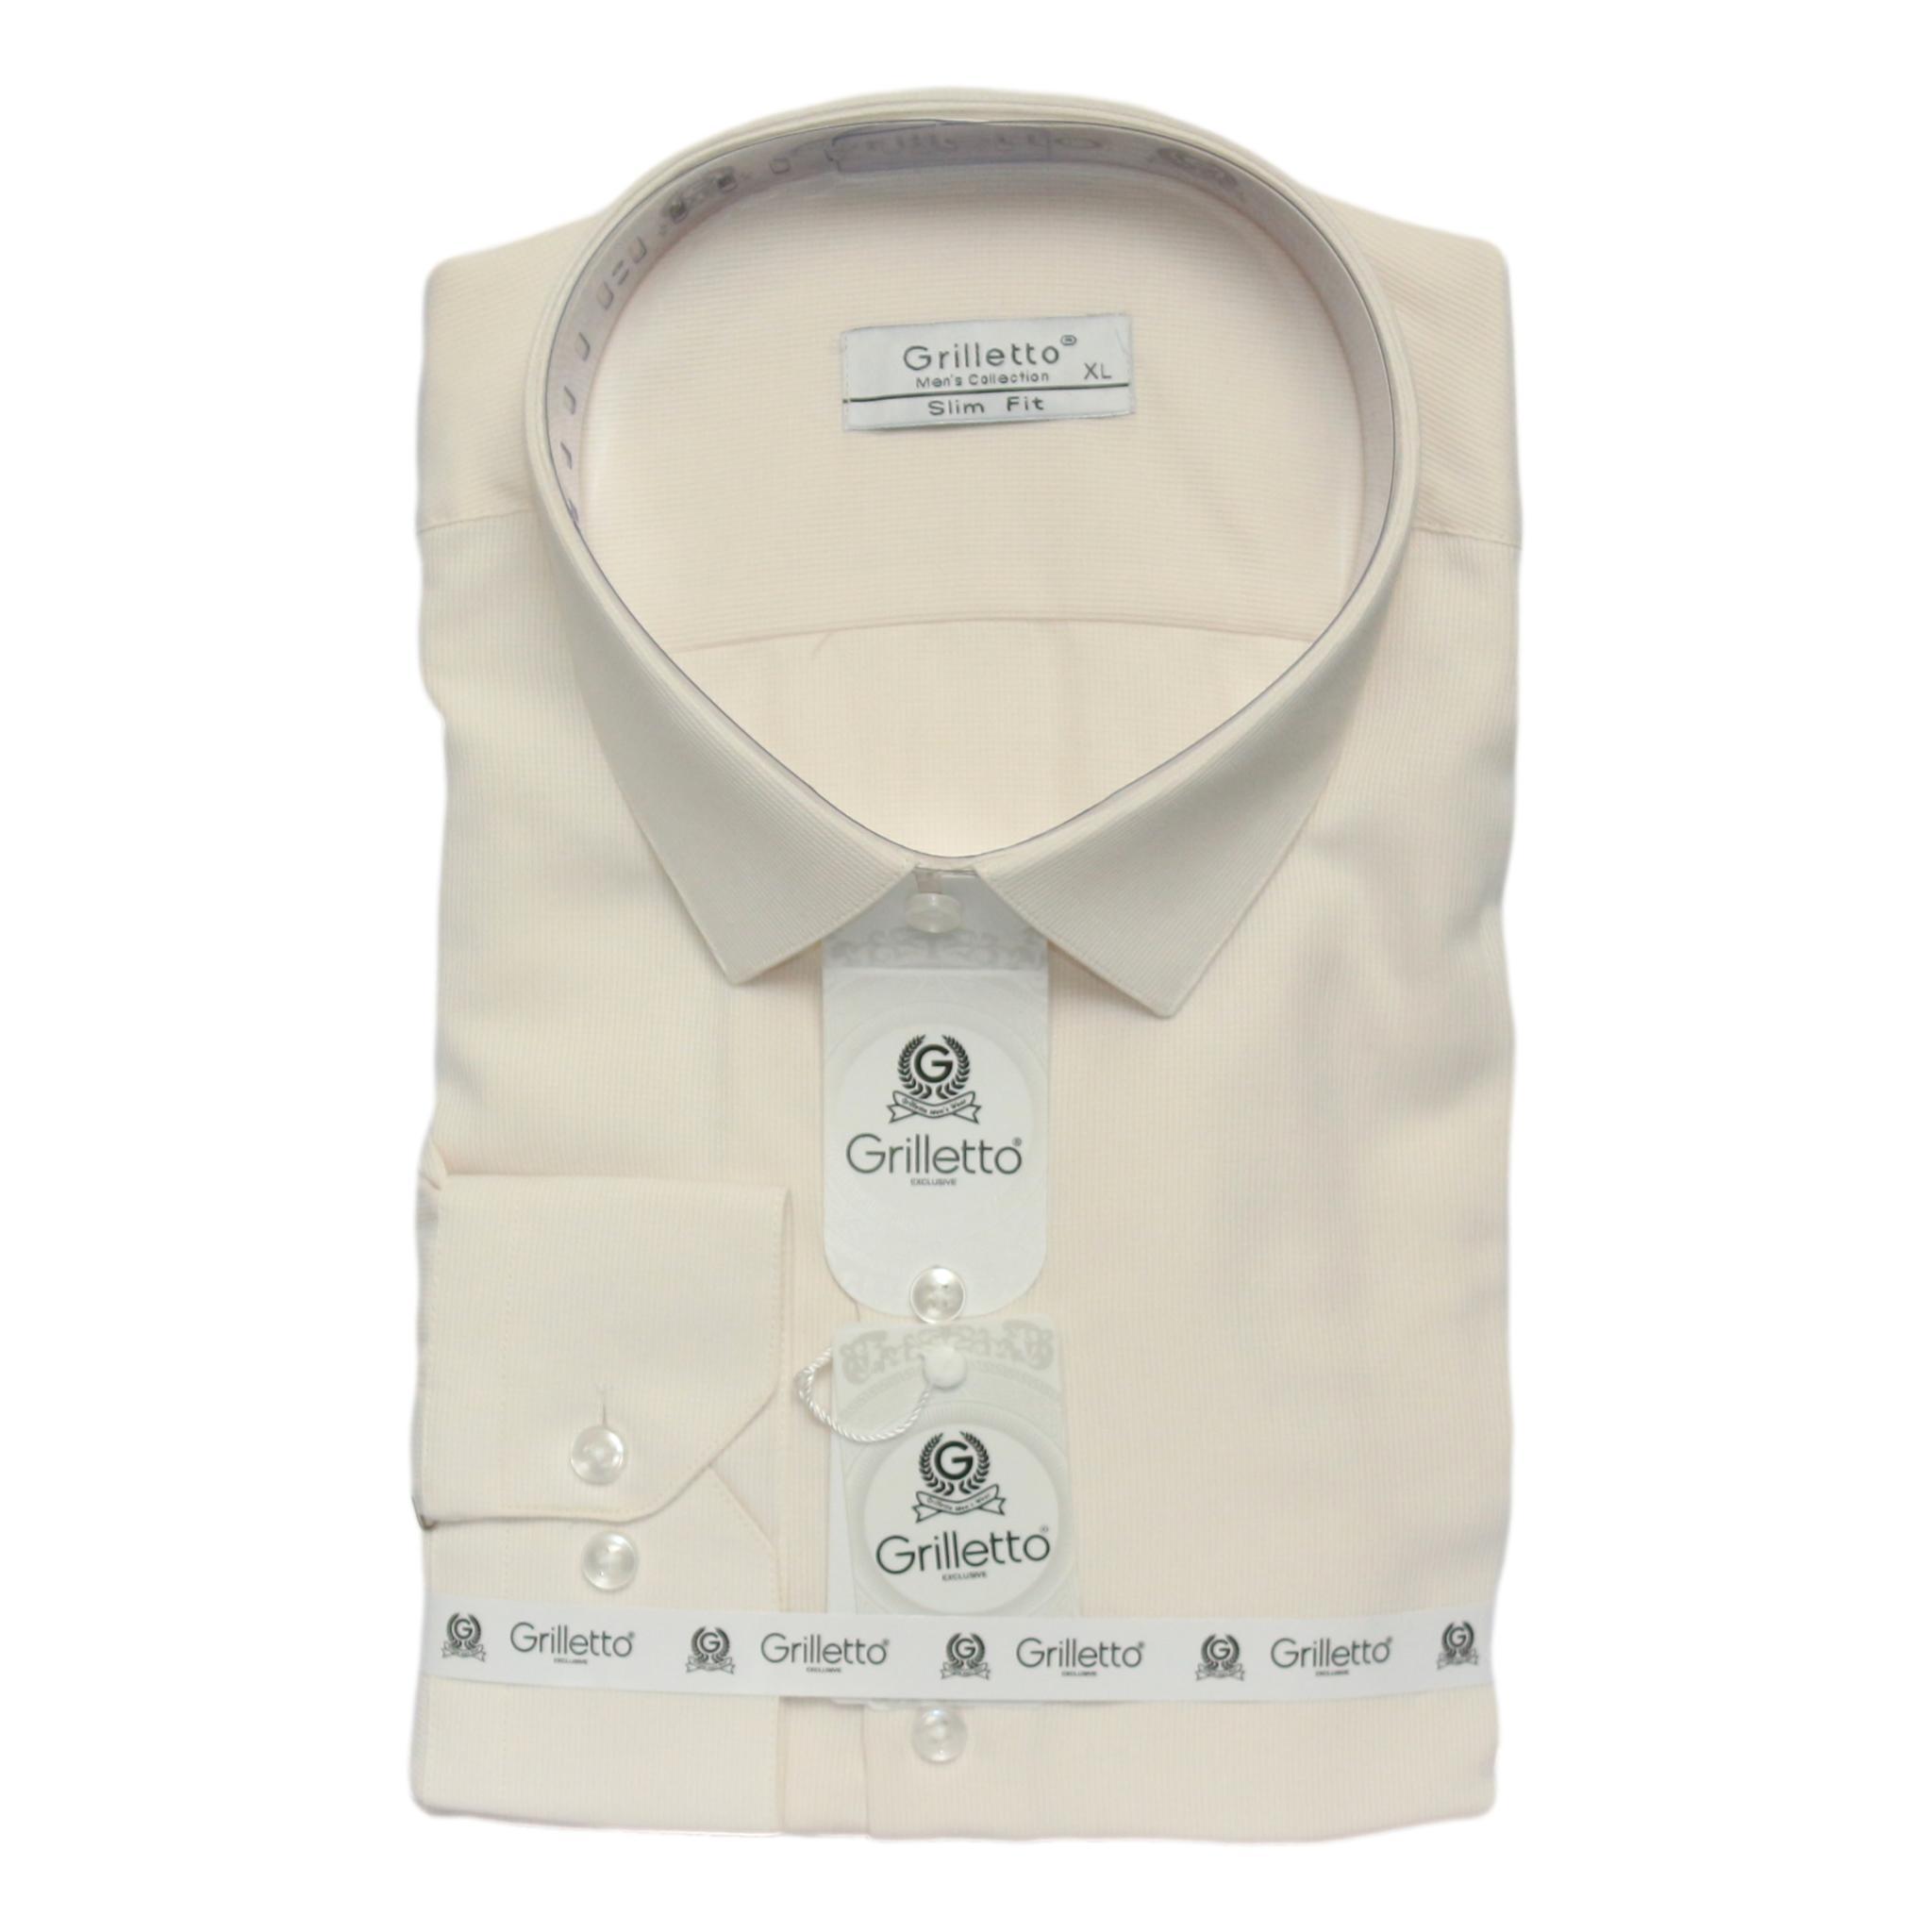 Chemises Homme Grilletto Slim